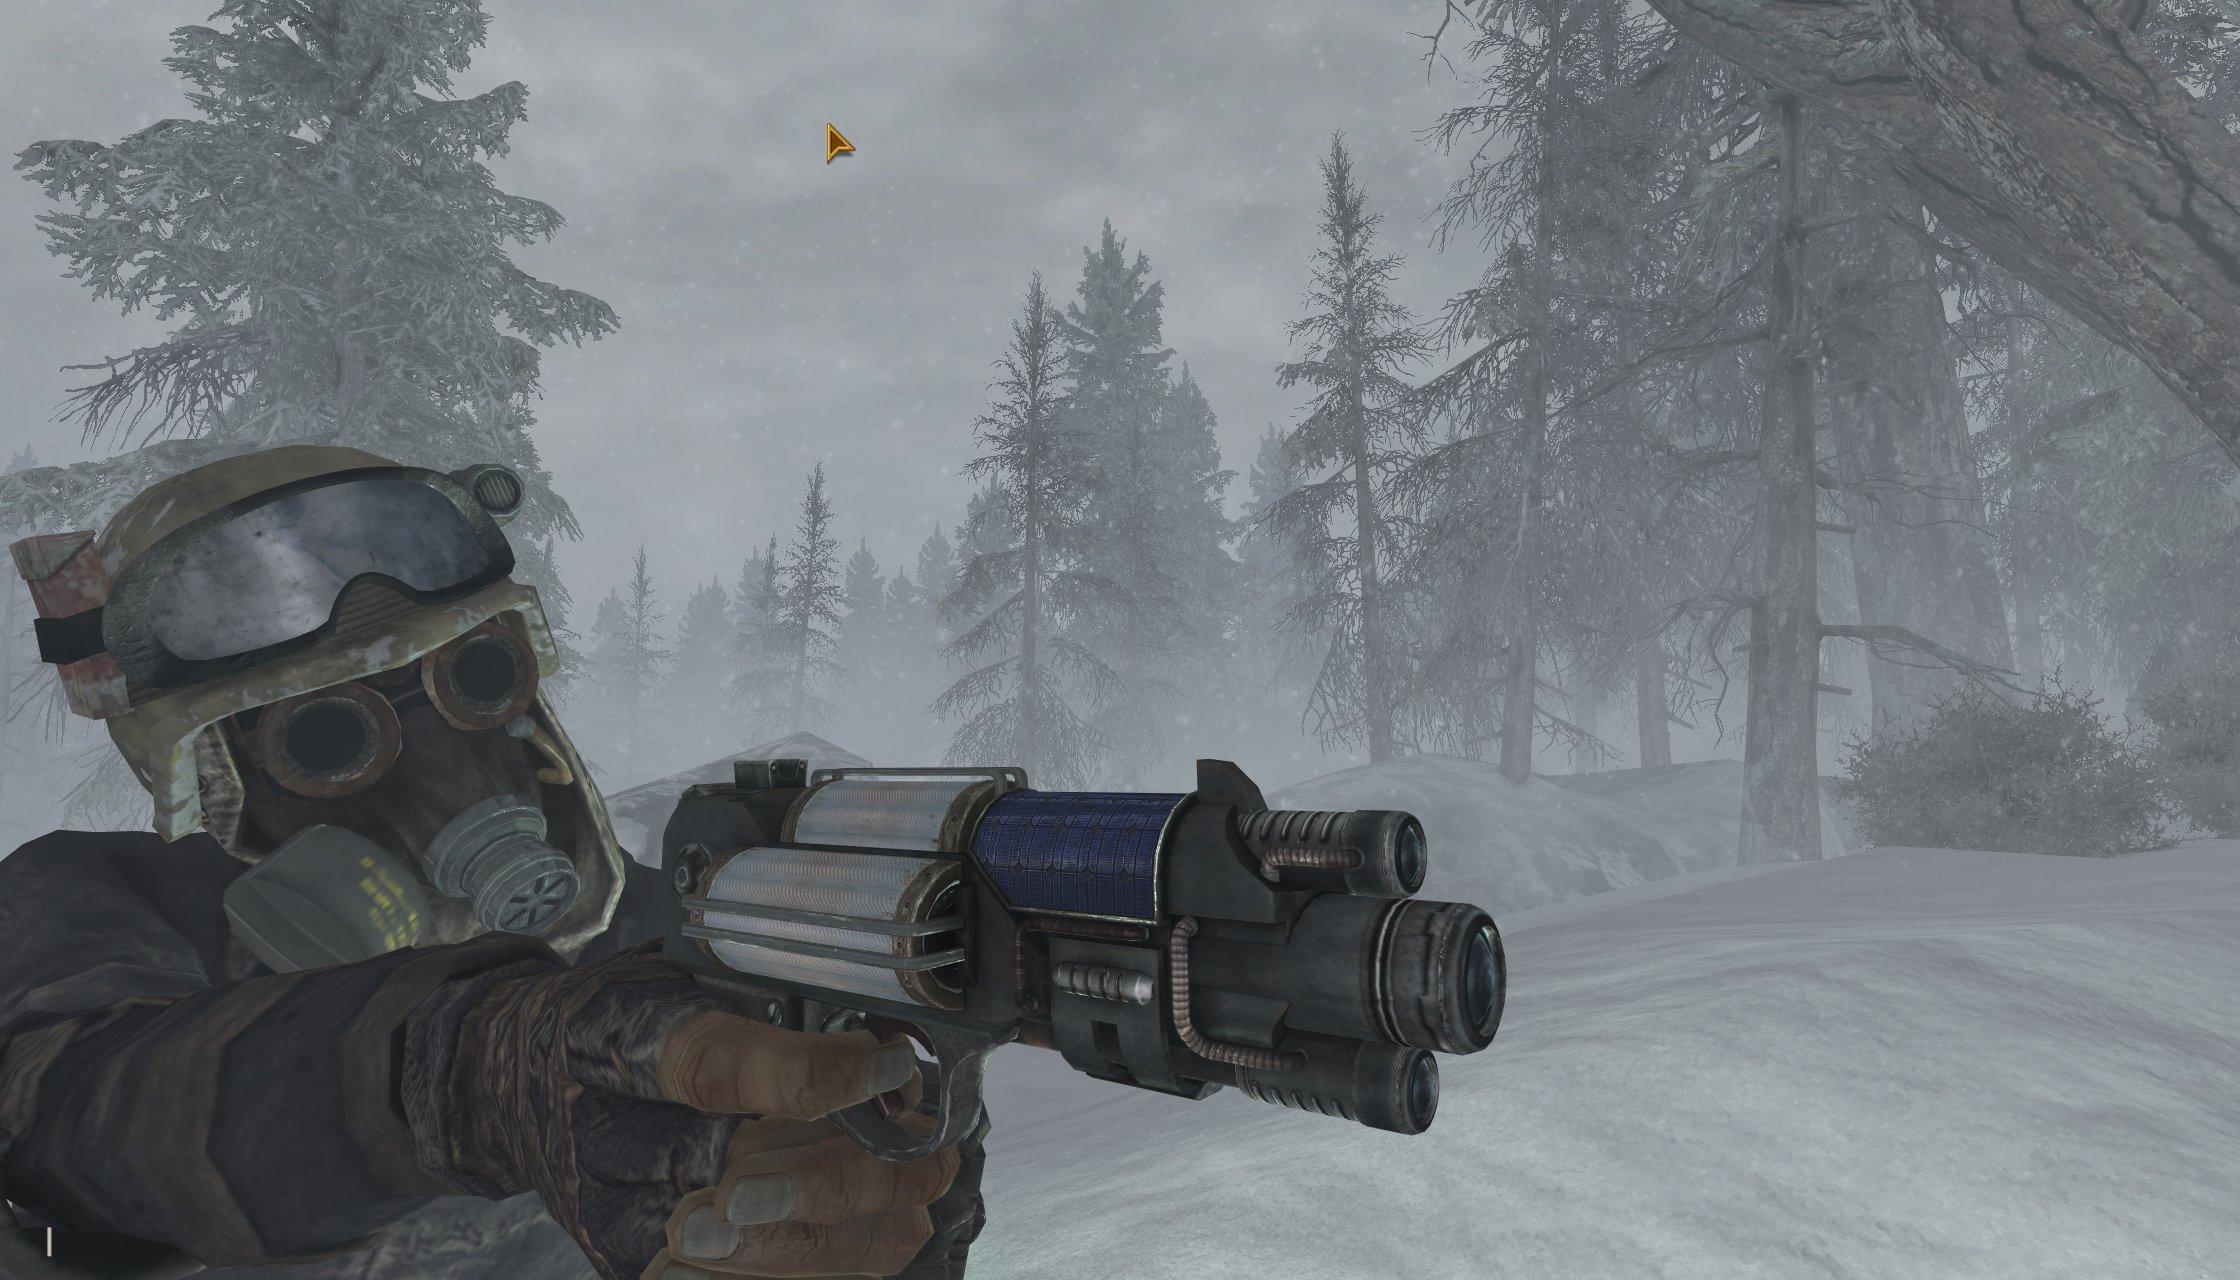 massive-fallout-new-vegas-mod-the-frontier-taken-offline-by-its-creators